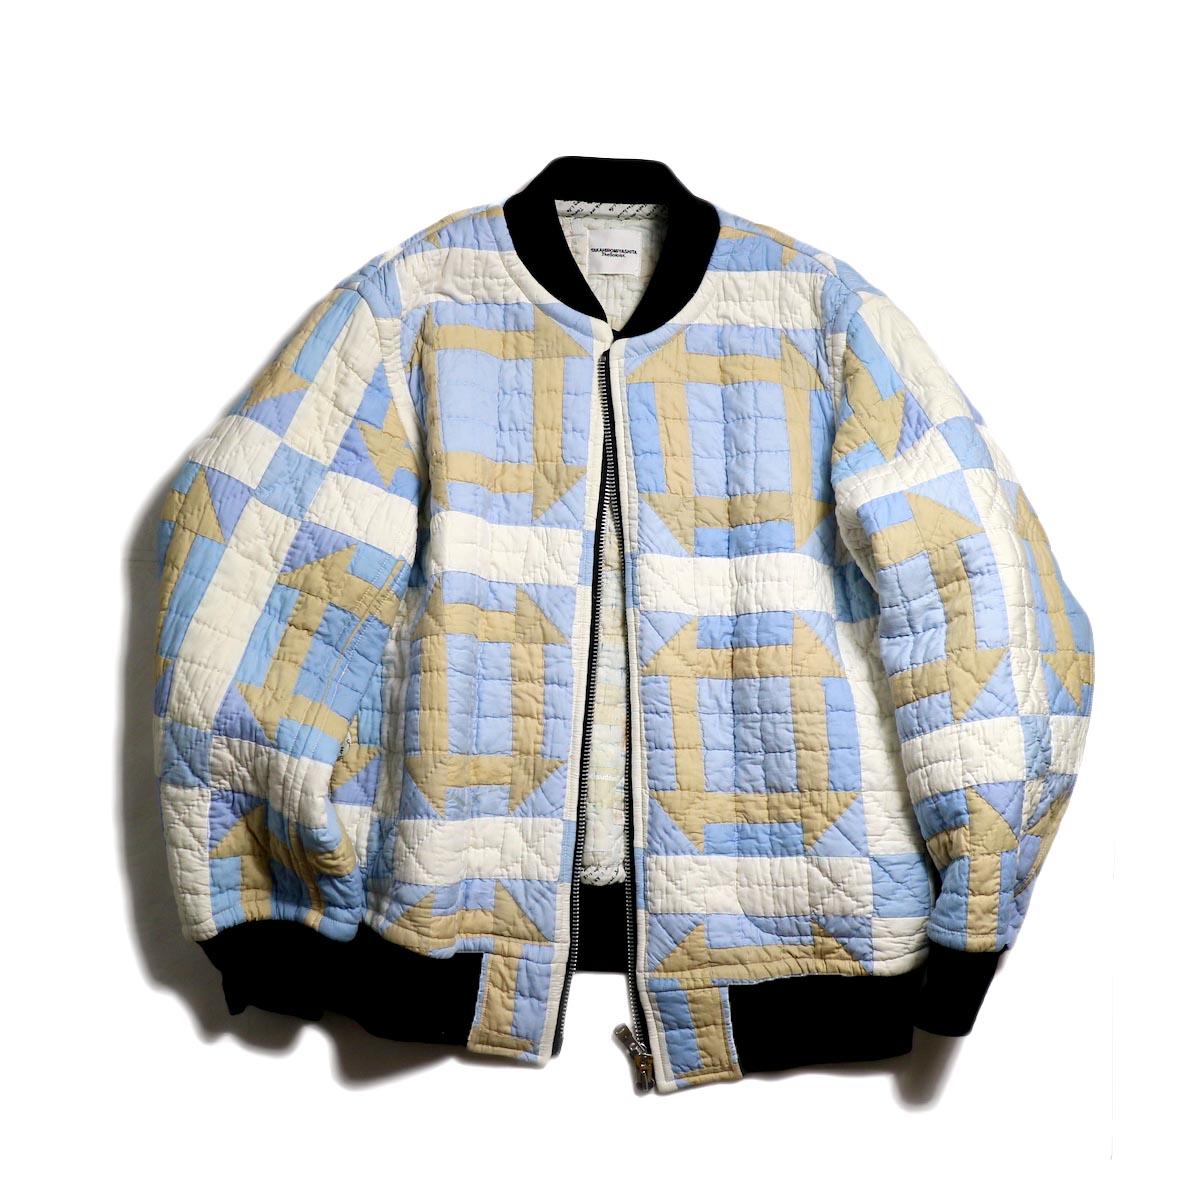 The Soloist / sw.0162 Vintage Quilt Flight Jacket.